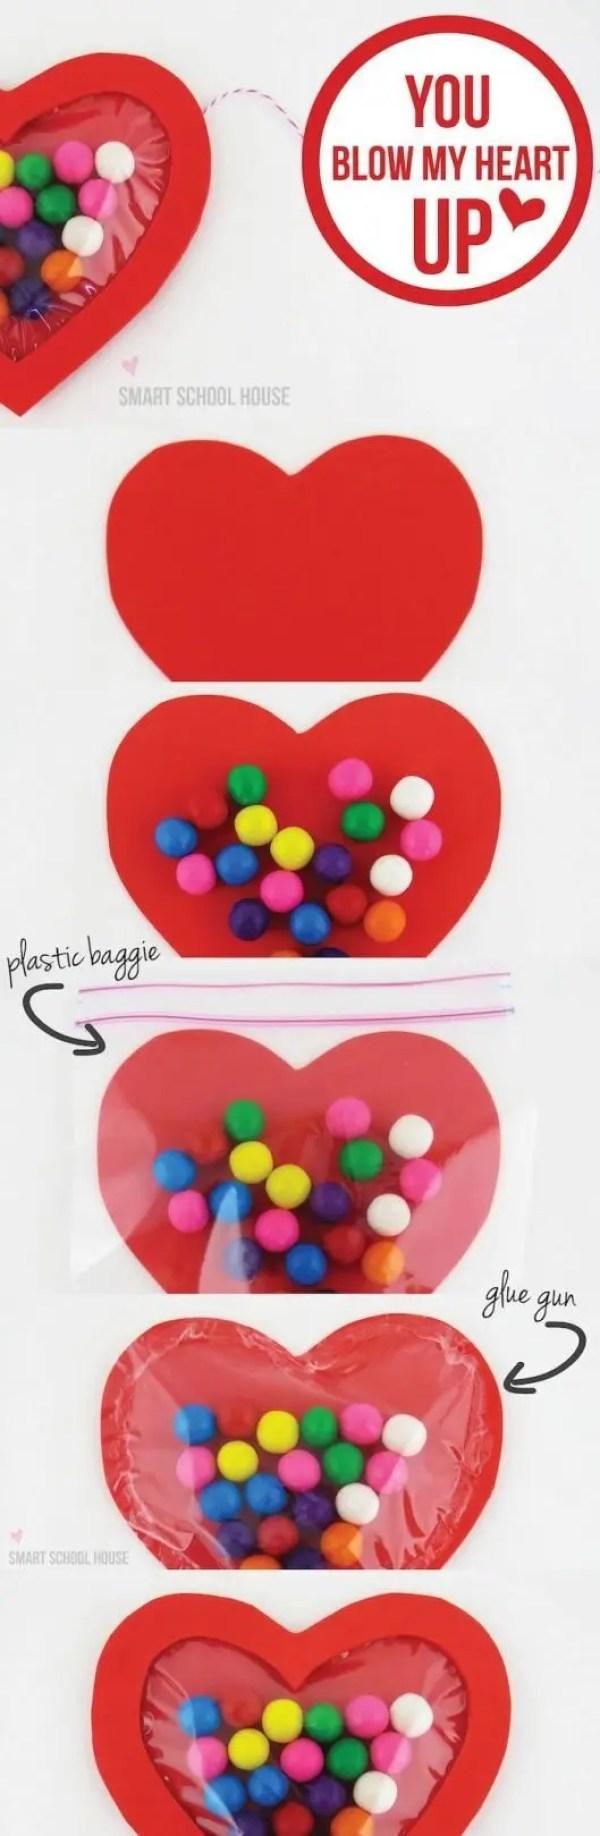 regalos-san-valentin-ideas8 (2)